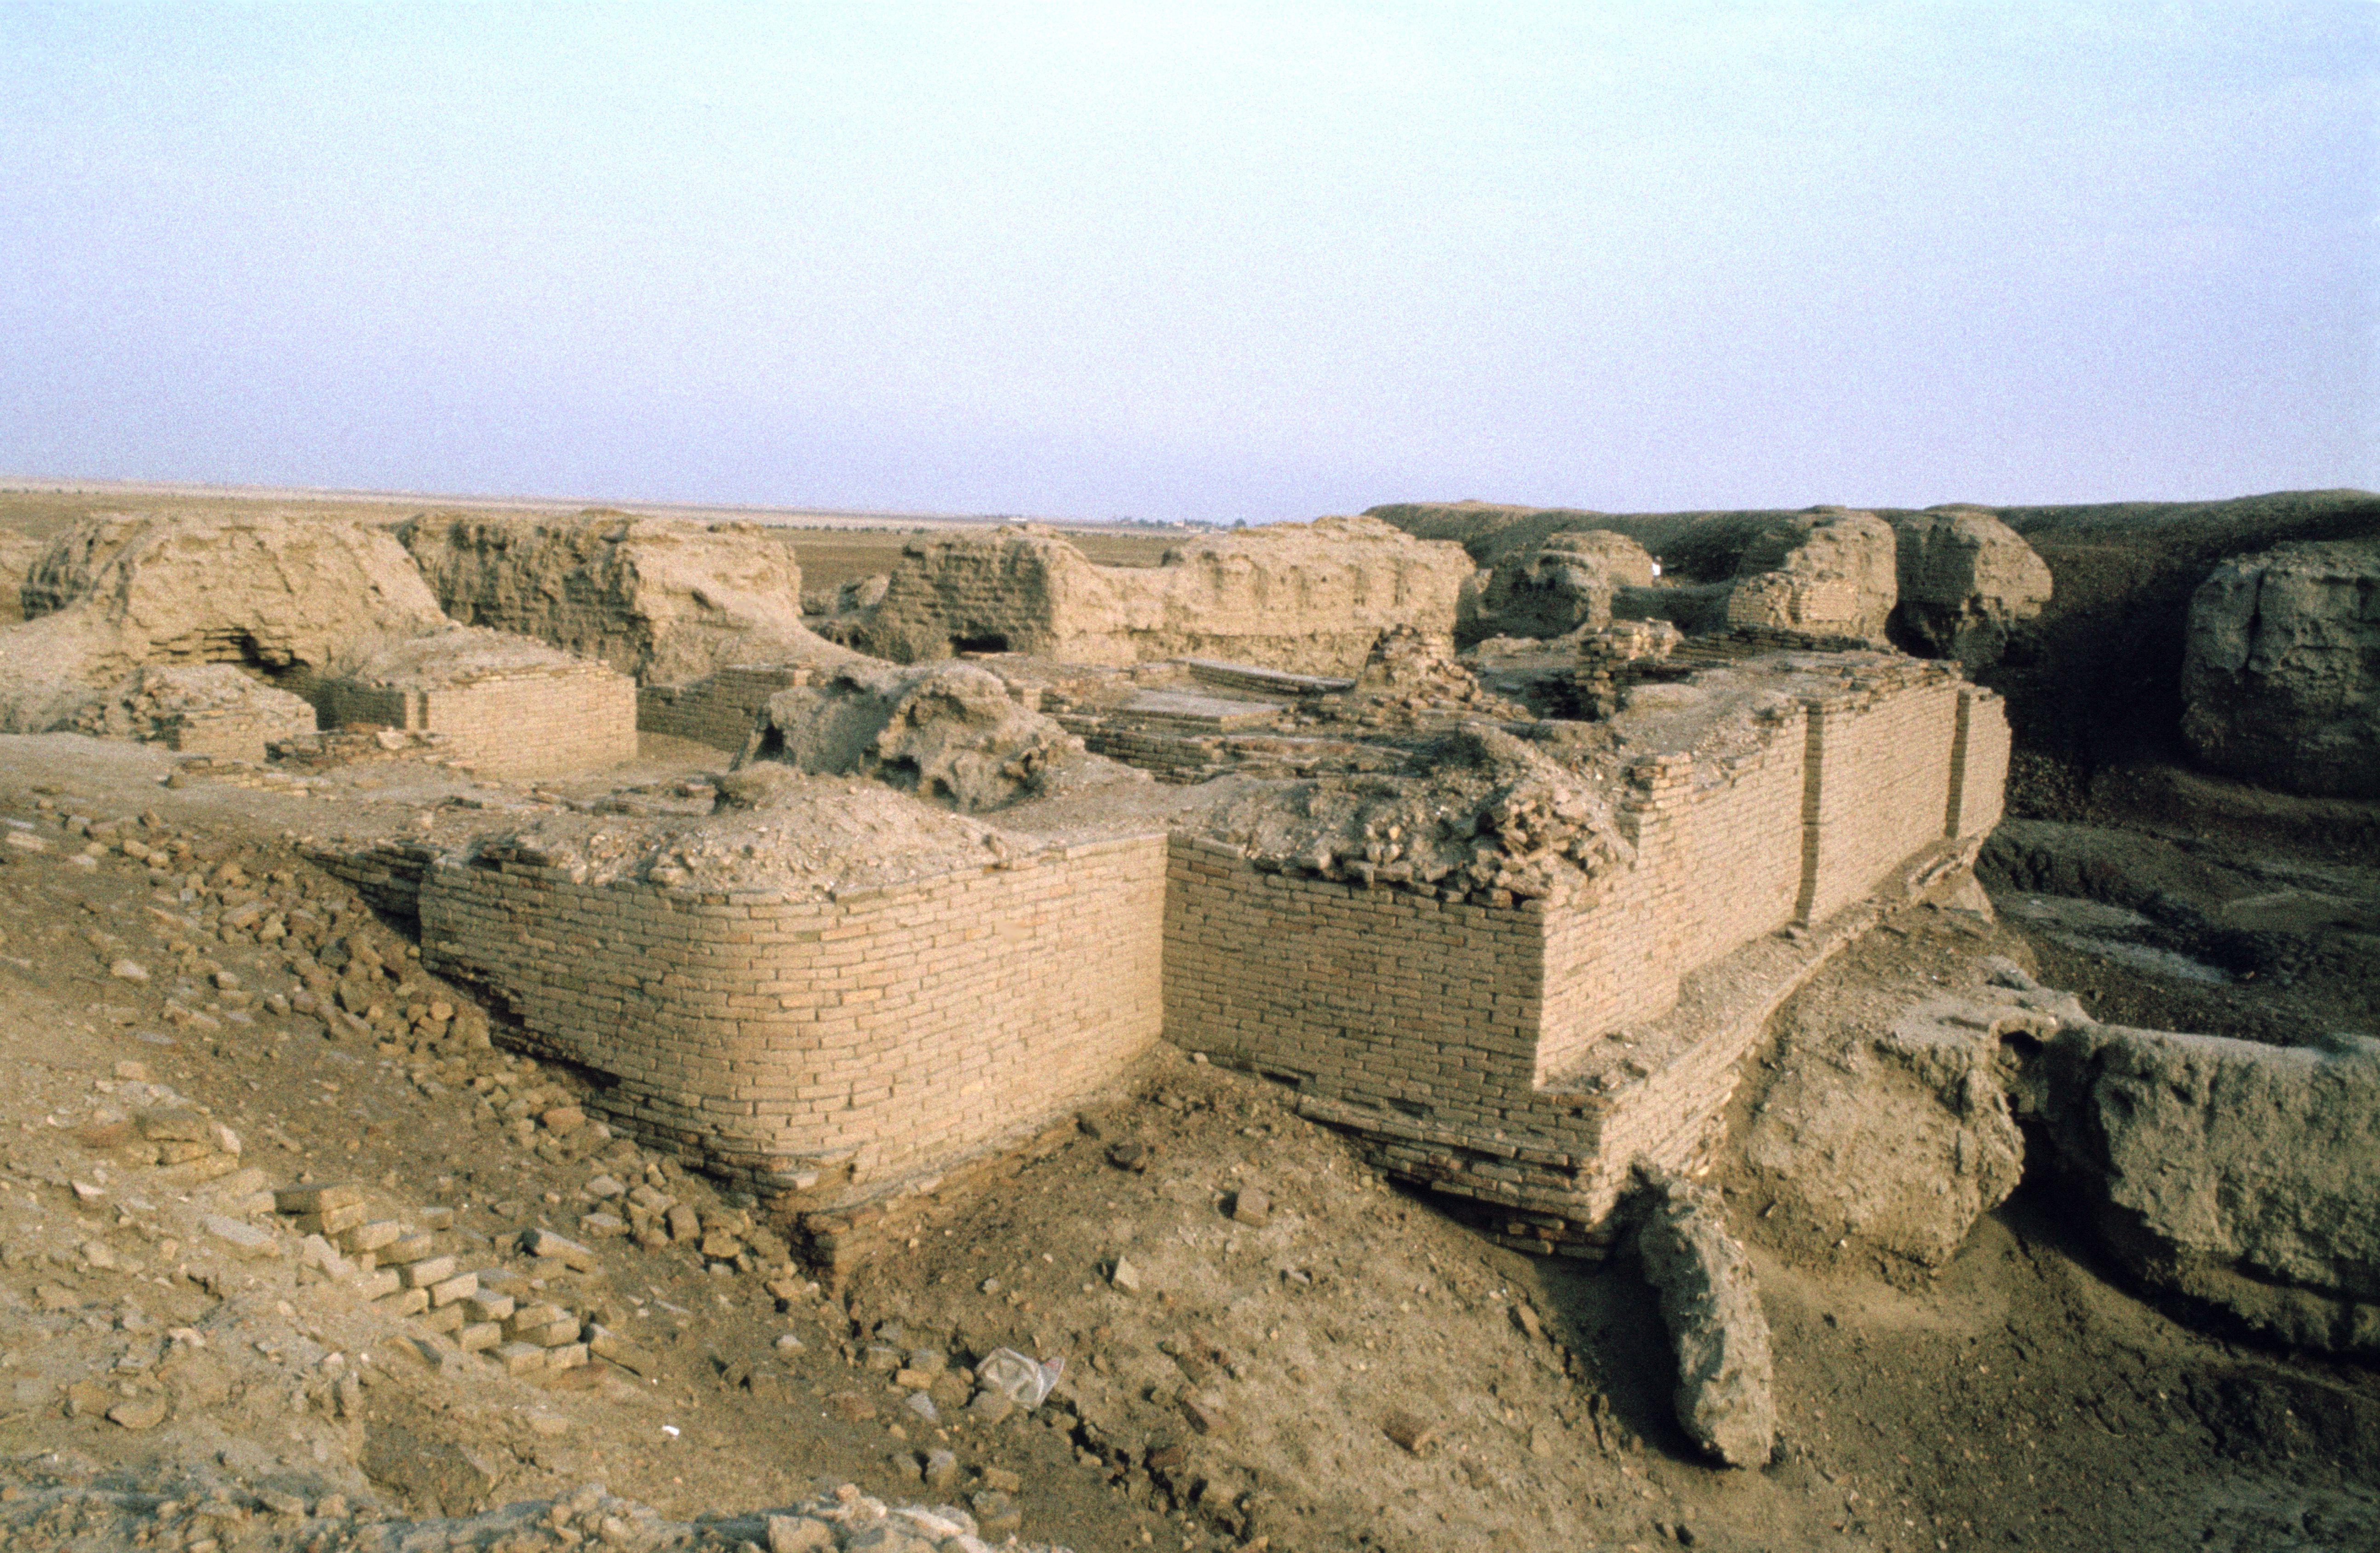 Royal cemetery, Ur, Iraq, 1977